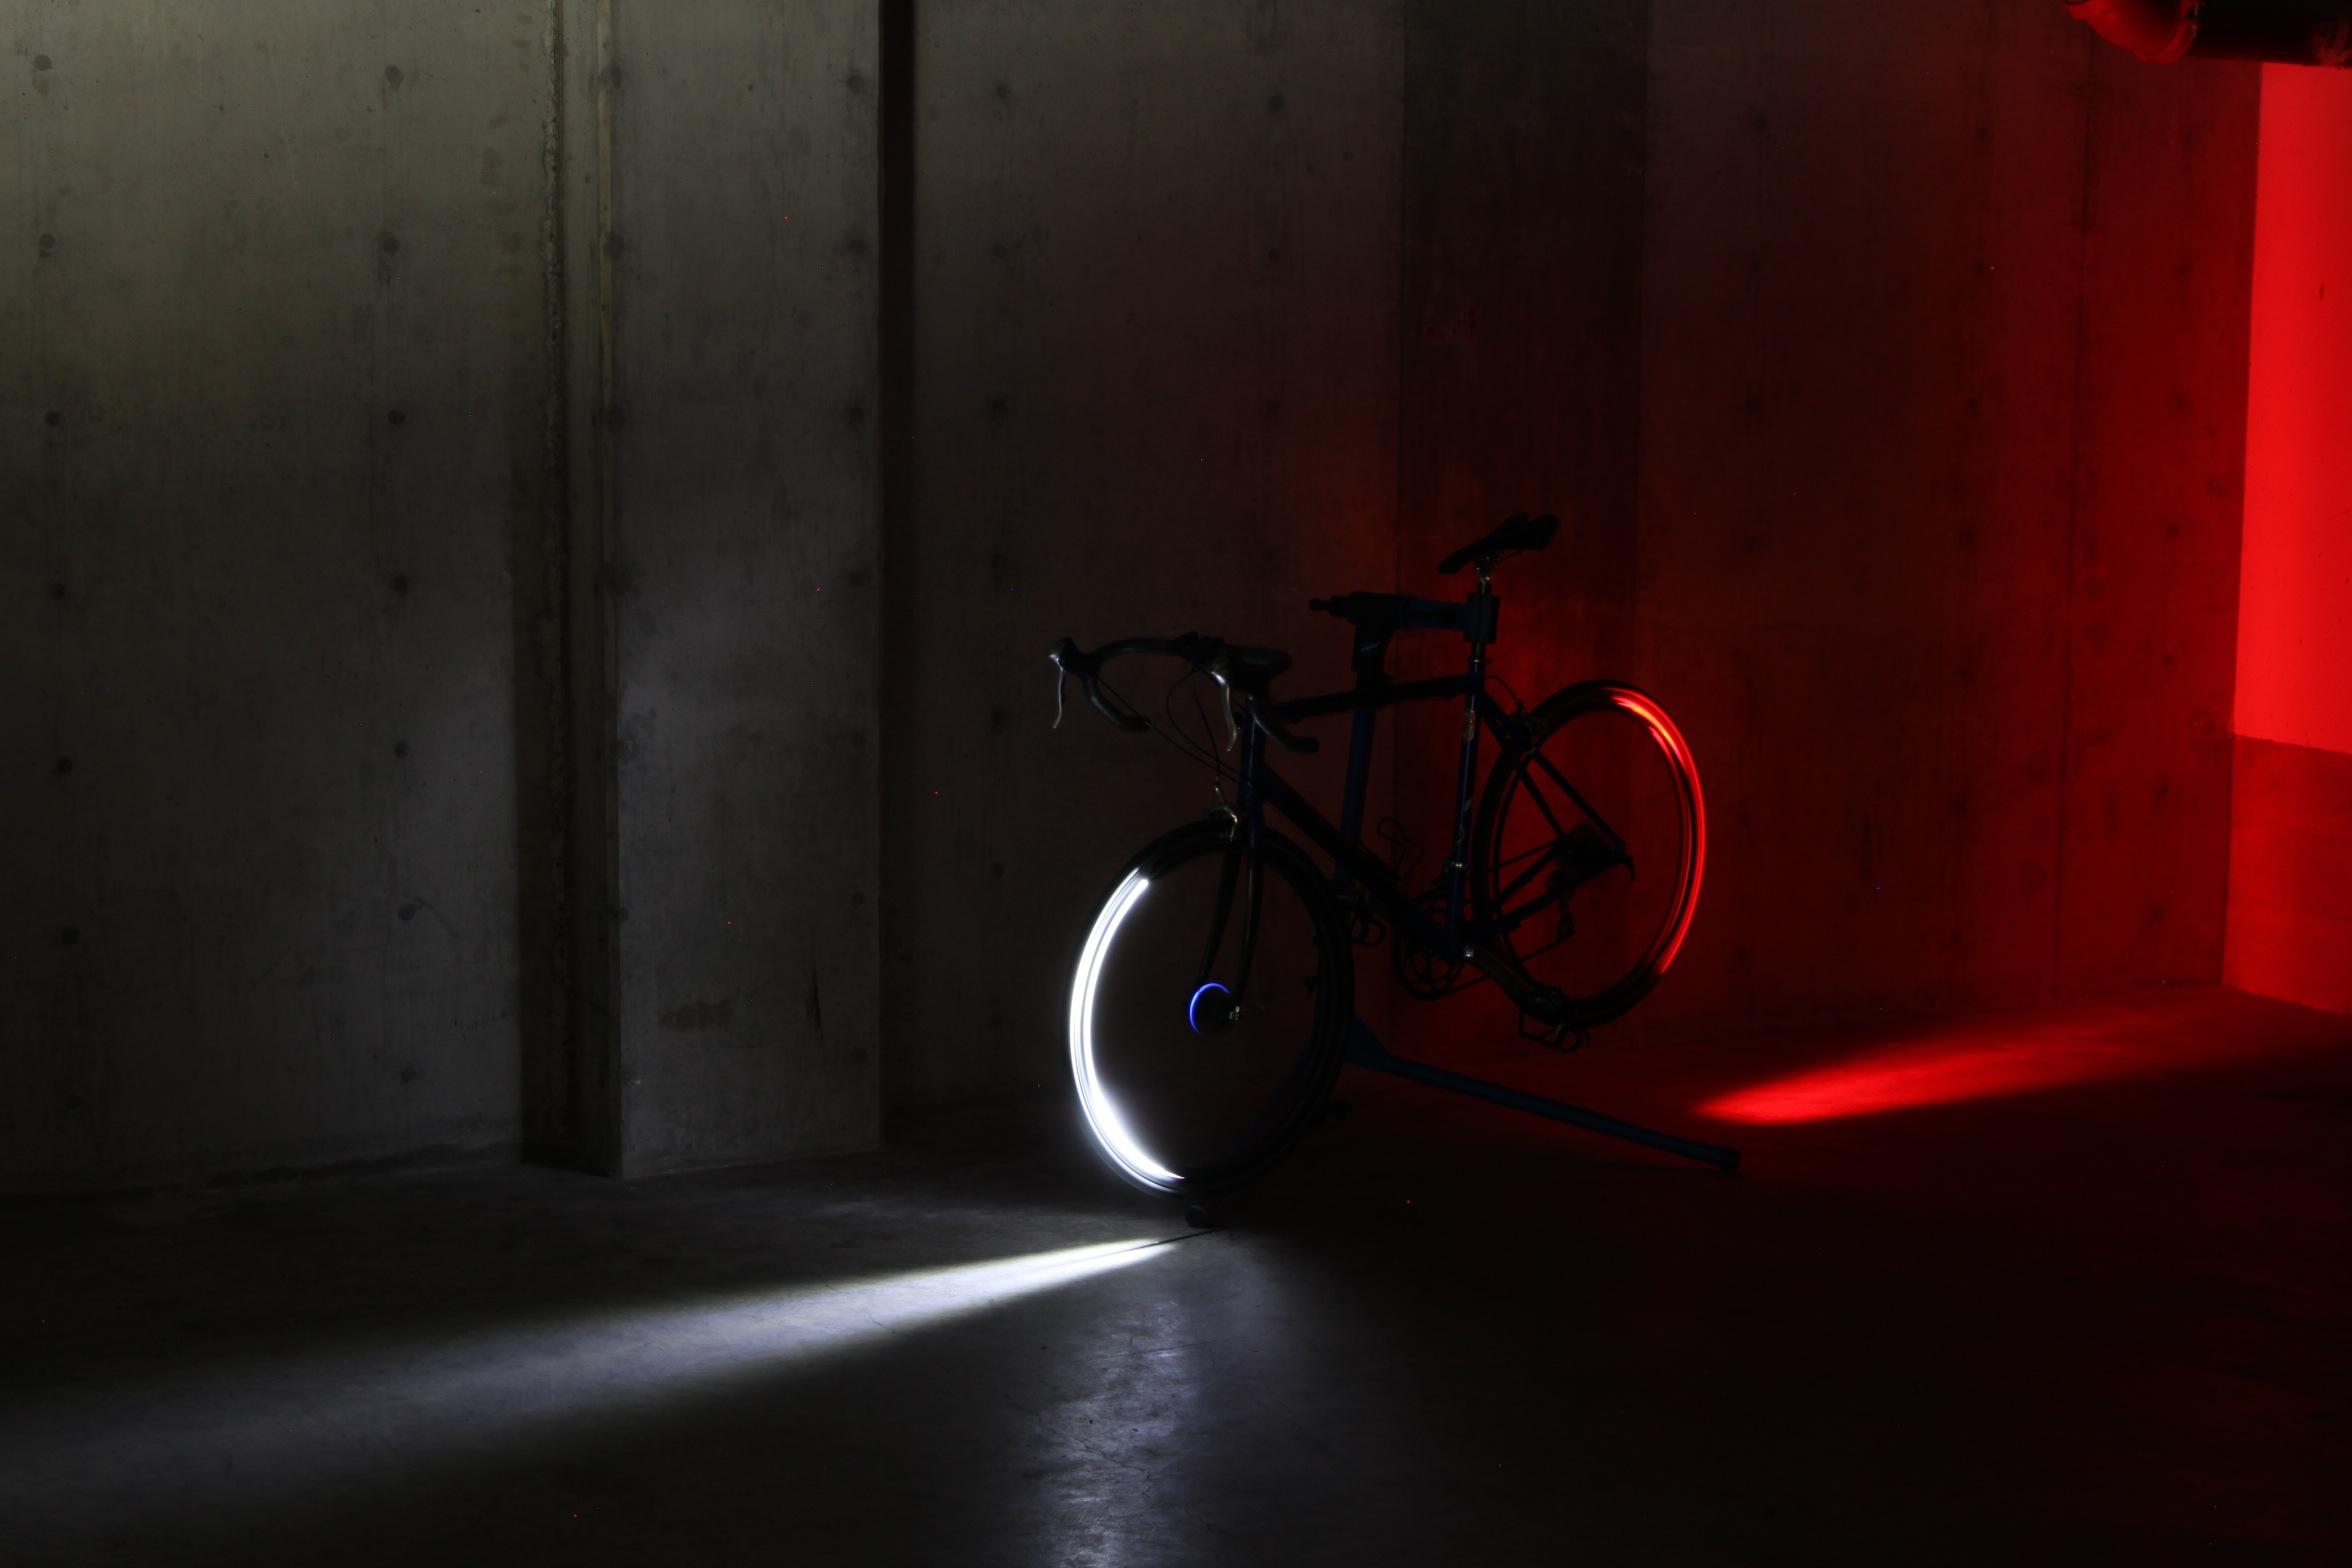 bike, bicycle, tron bike, bicycle lights, bike lights, revolights, red light, white light, shadow